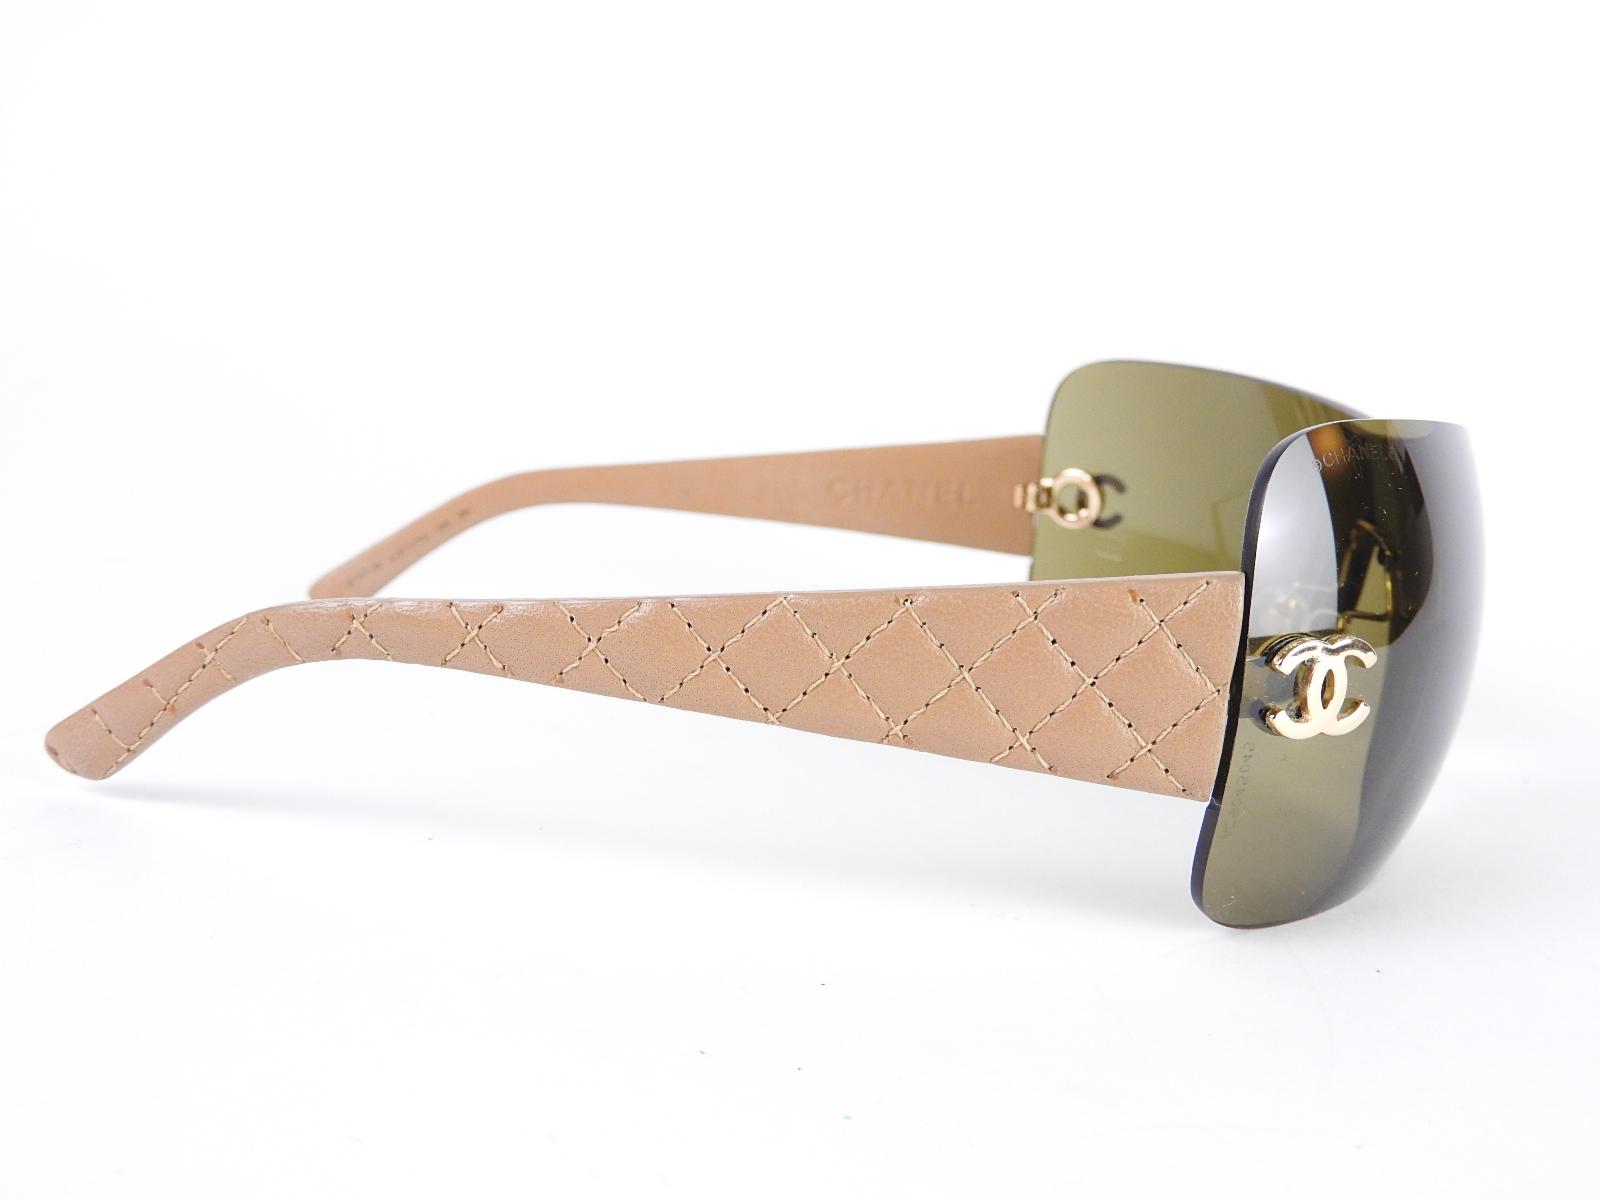 Chanel Glasses Frames Leather : Auth CHANEL CC Logo Matelasse Sun Glasses Plastic Leather ...